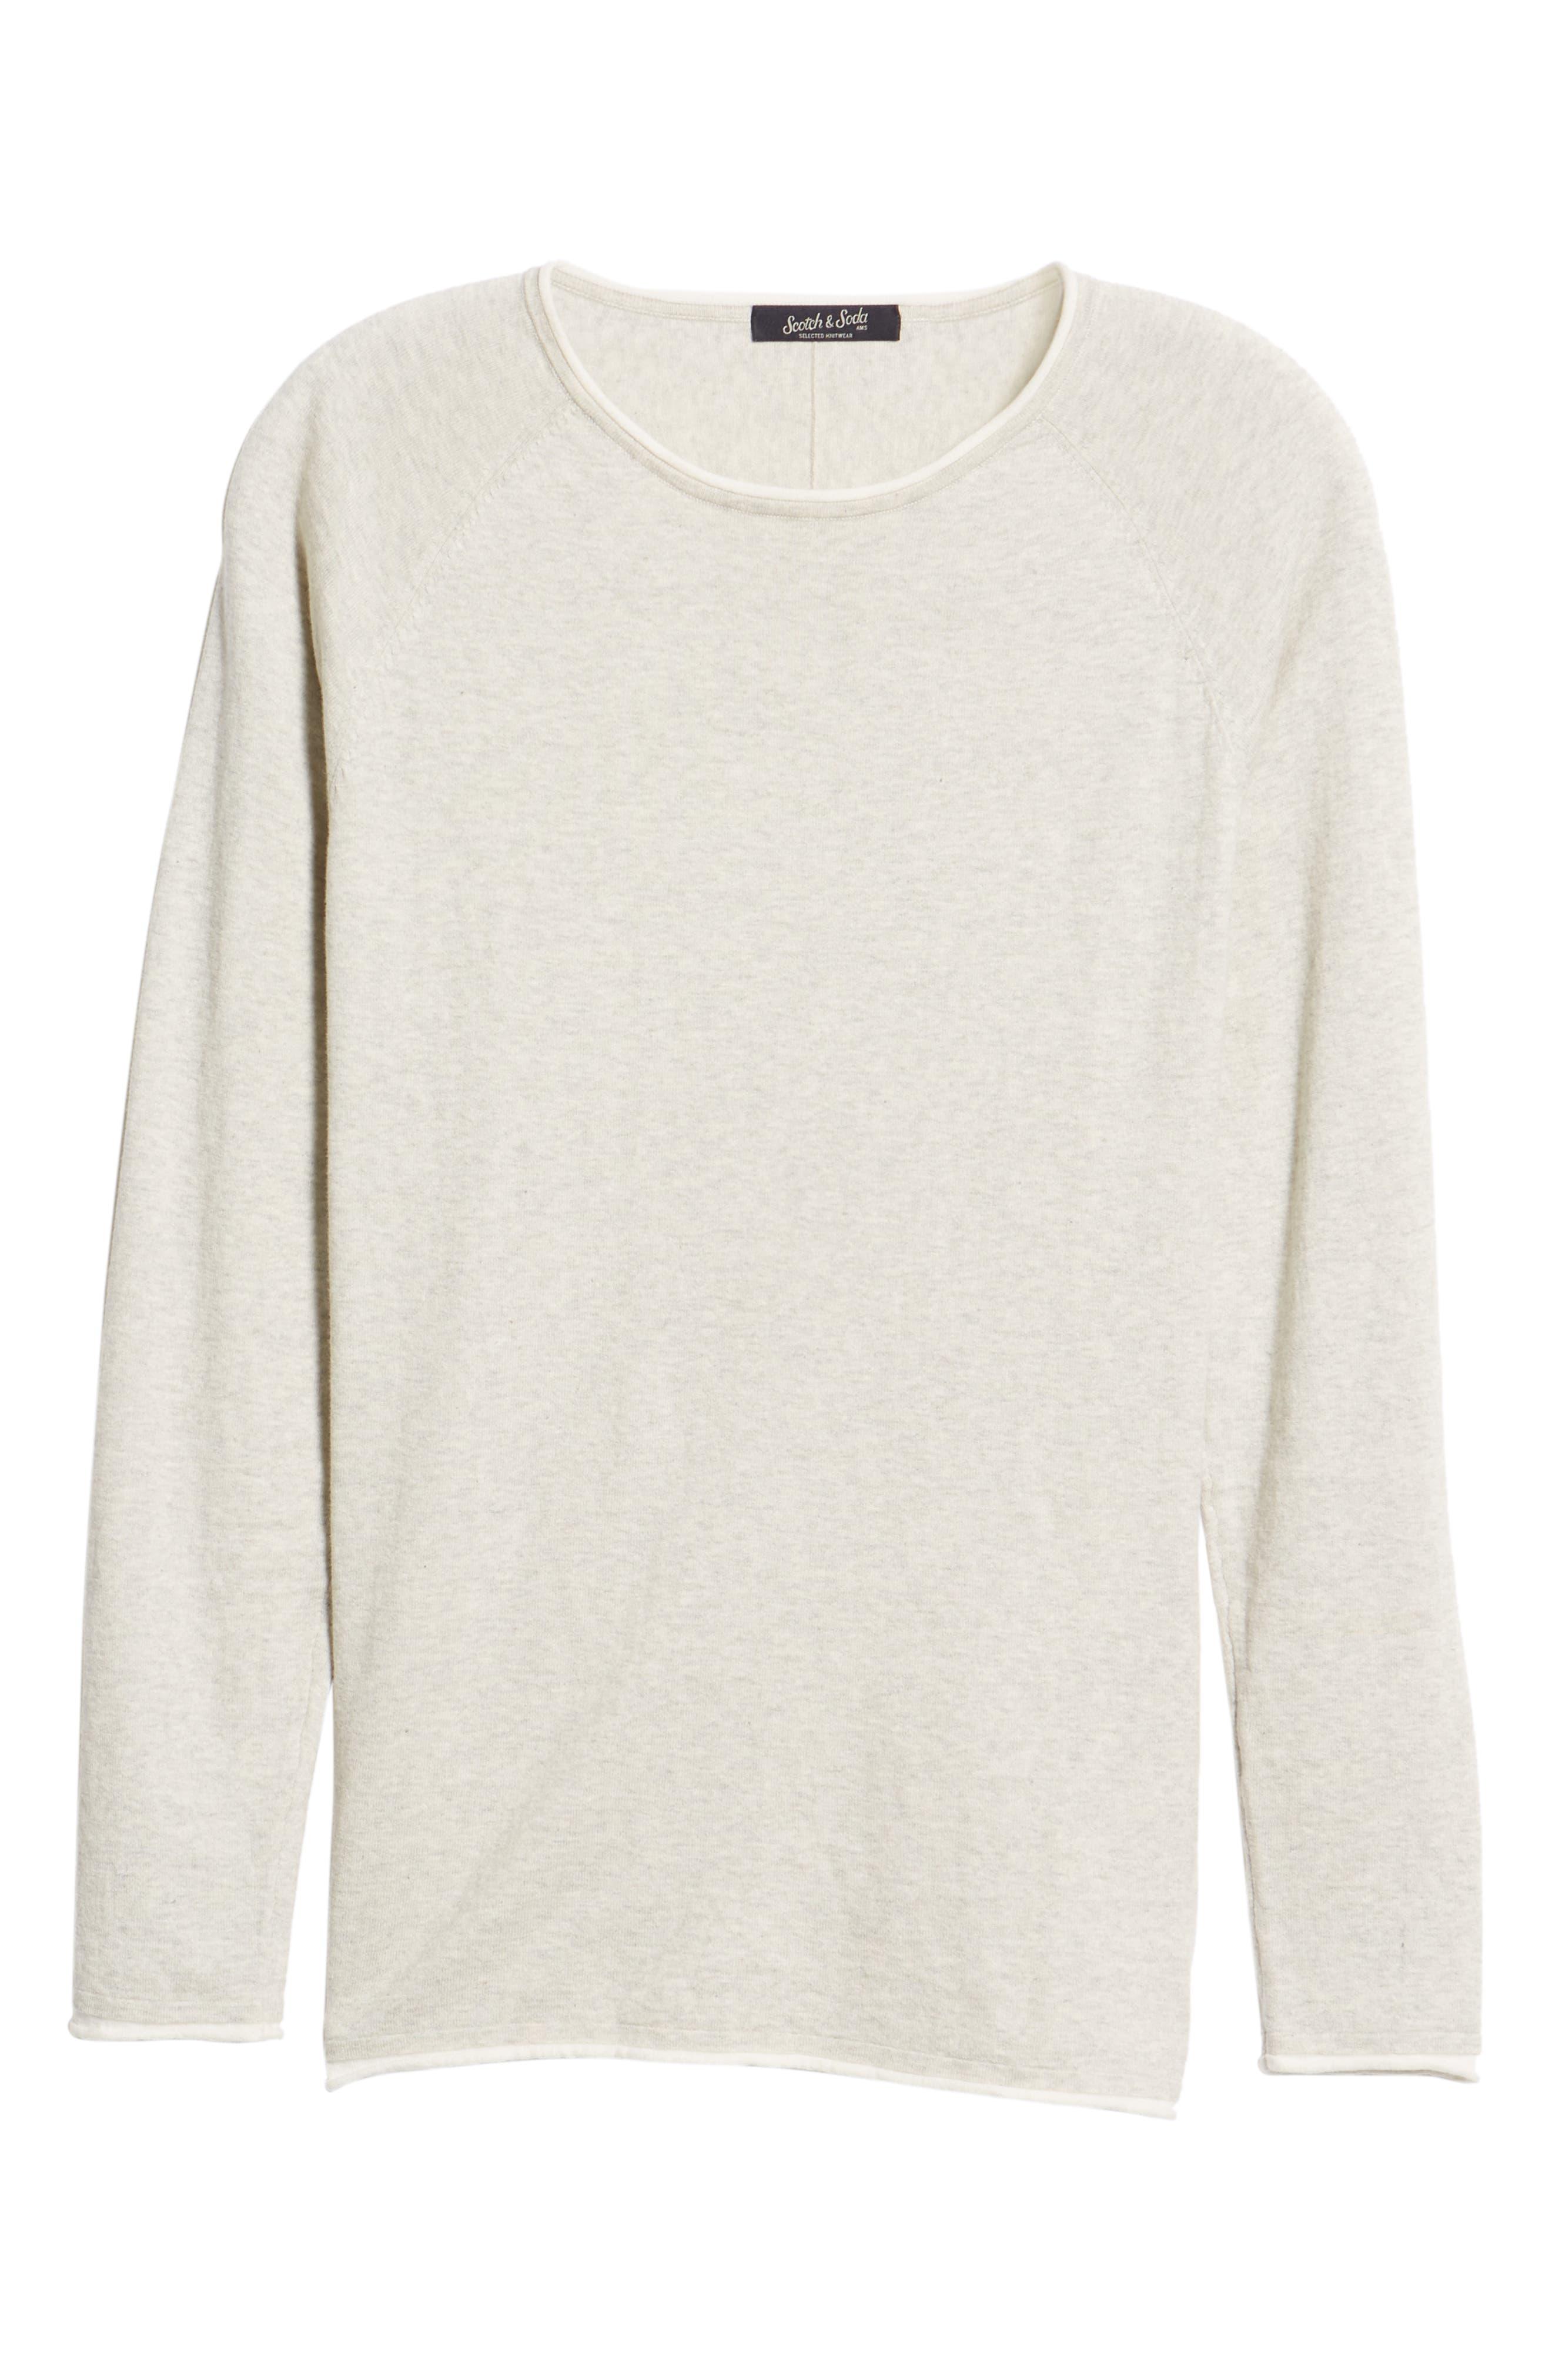 Crewneck Sweatshirt,                             Alternate thumbnail 6, color,                             BONE WHITE MELANGE